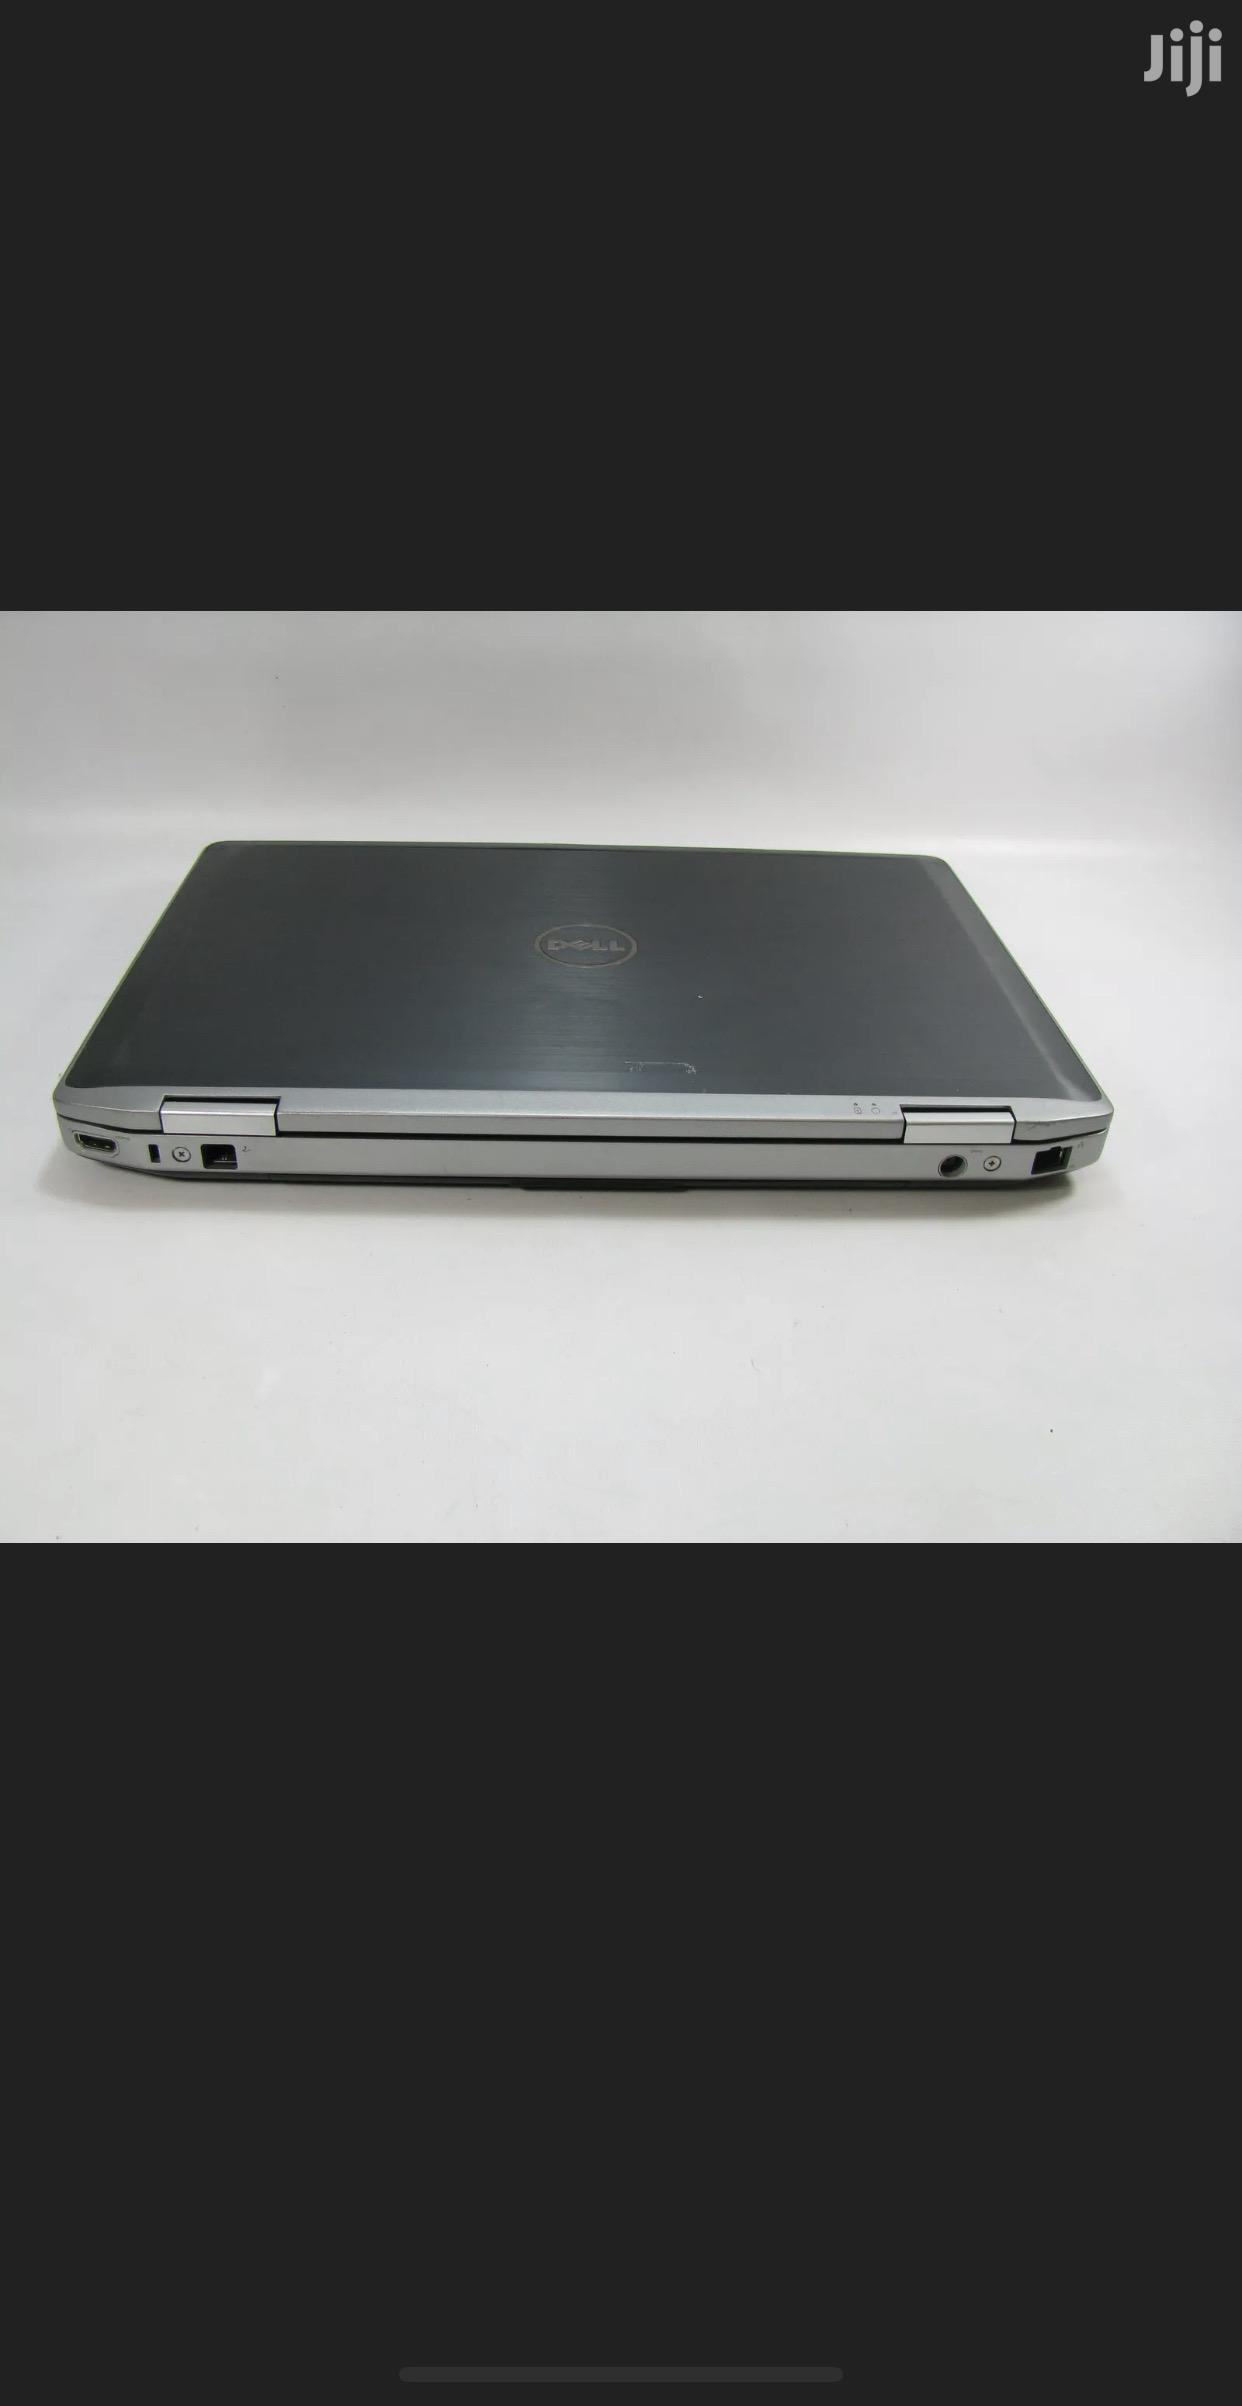 Laptop Dell Latitude E6420 4GB Intel Core I7 HDD 500GB | Laptops & Computers for sale in Kumasi Metropolitan, Ashanti, Ghana